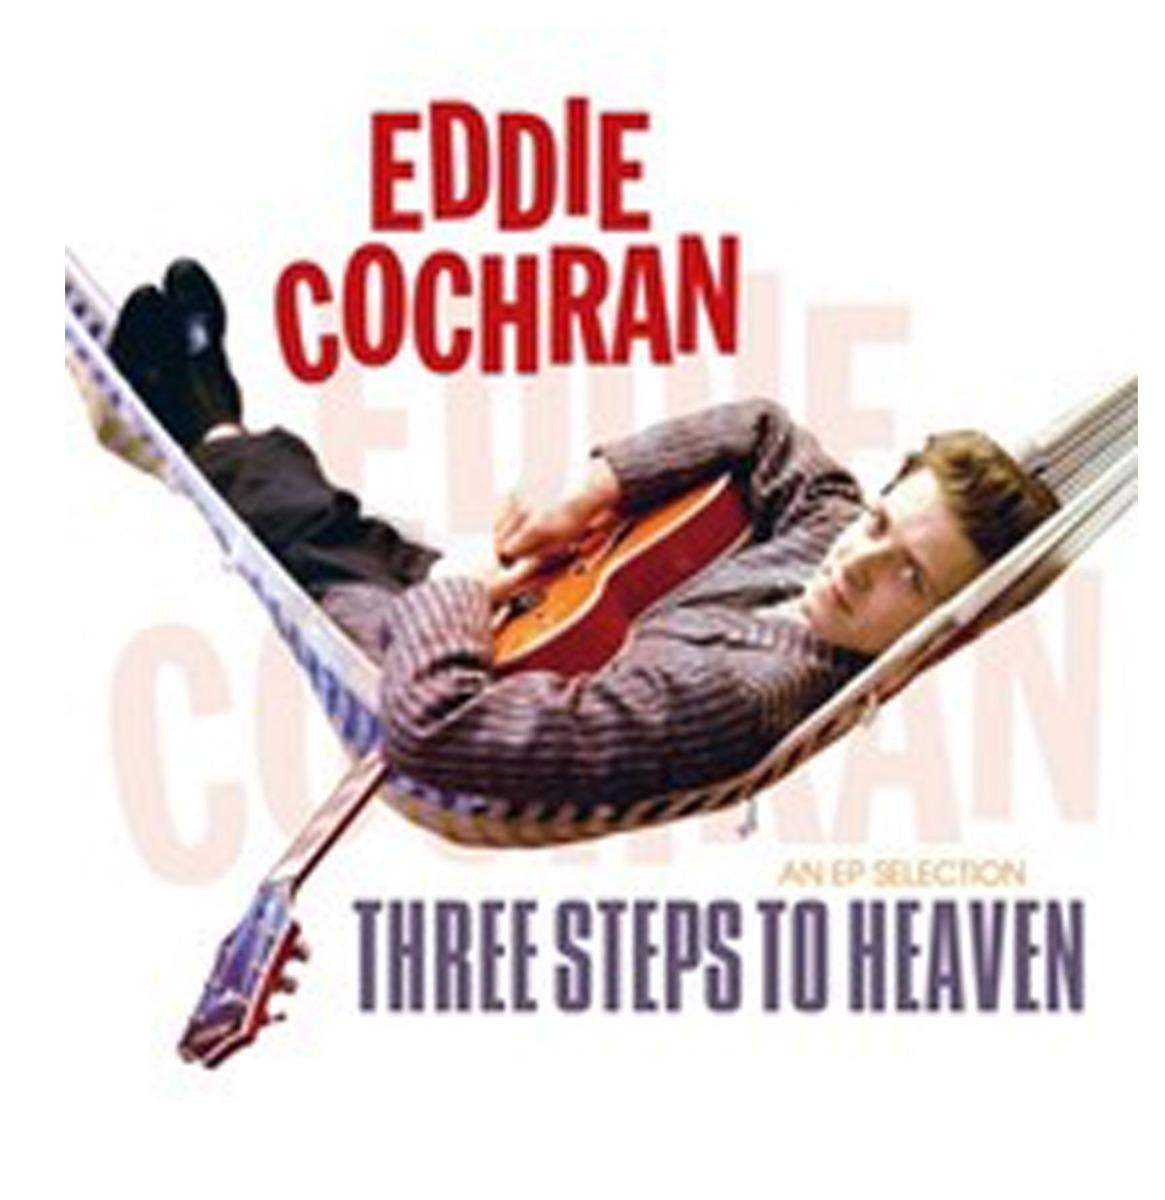 Eddie Cochran LP - Three Steps To Heaven An EP Selectie